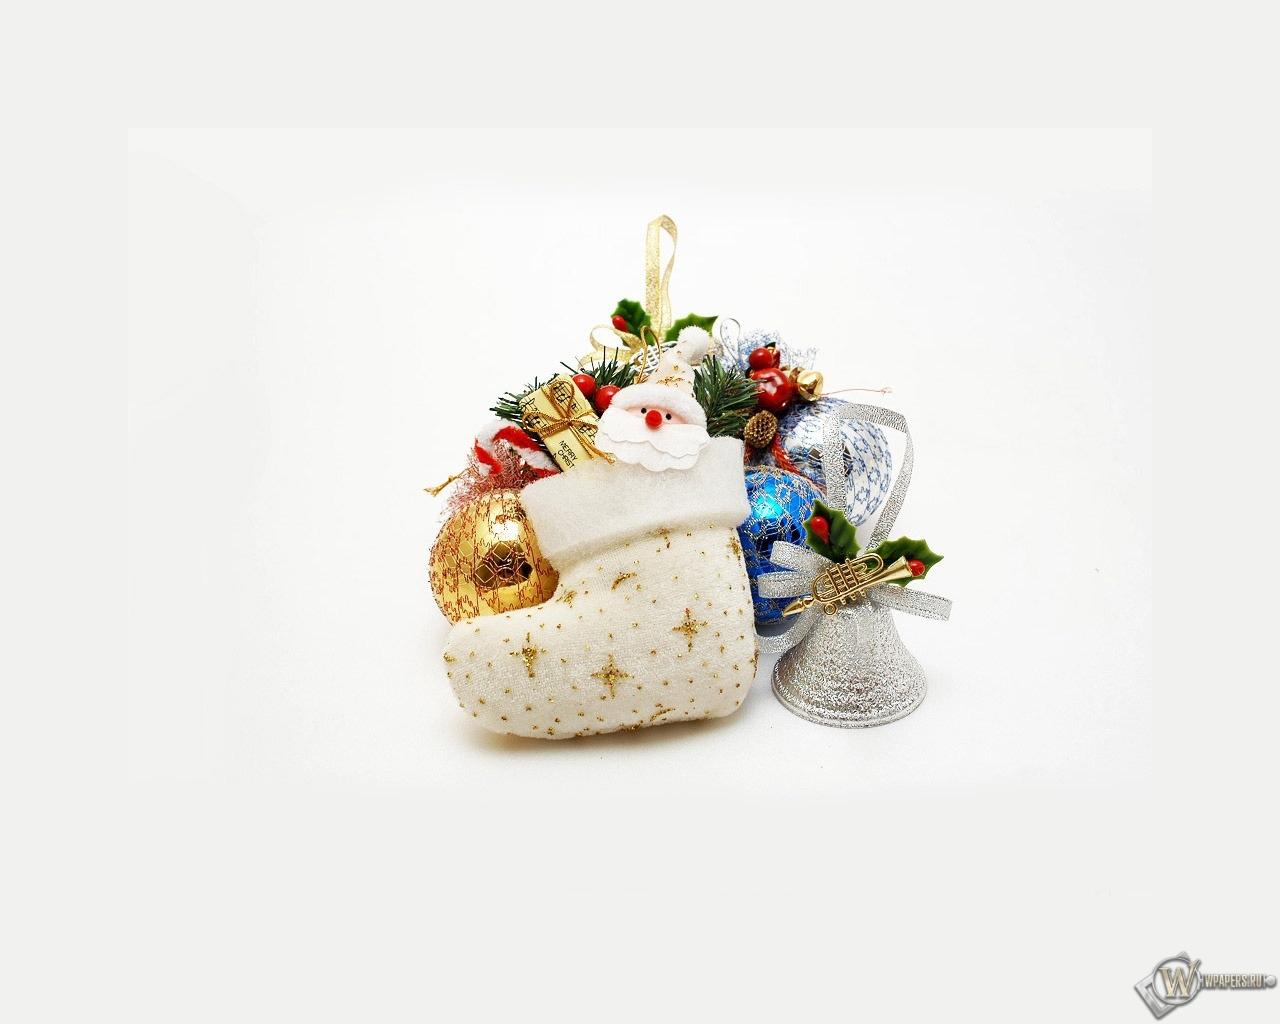 Christmas stuff 1280x1024